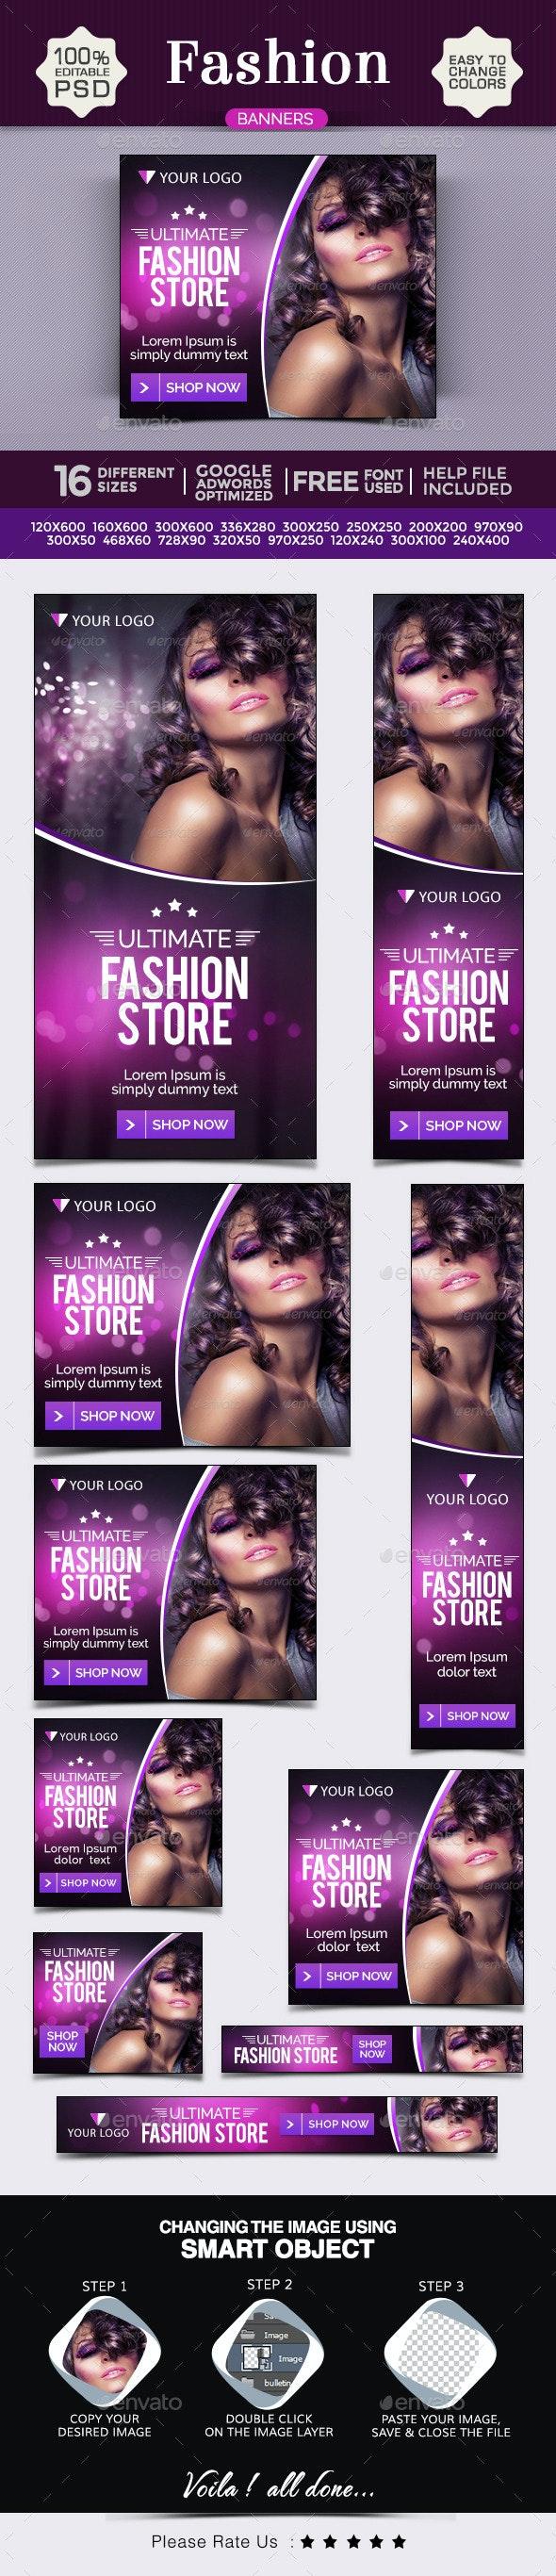 Fashion Banner Design Set - Banners & Ads Web Elements